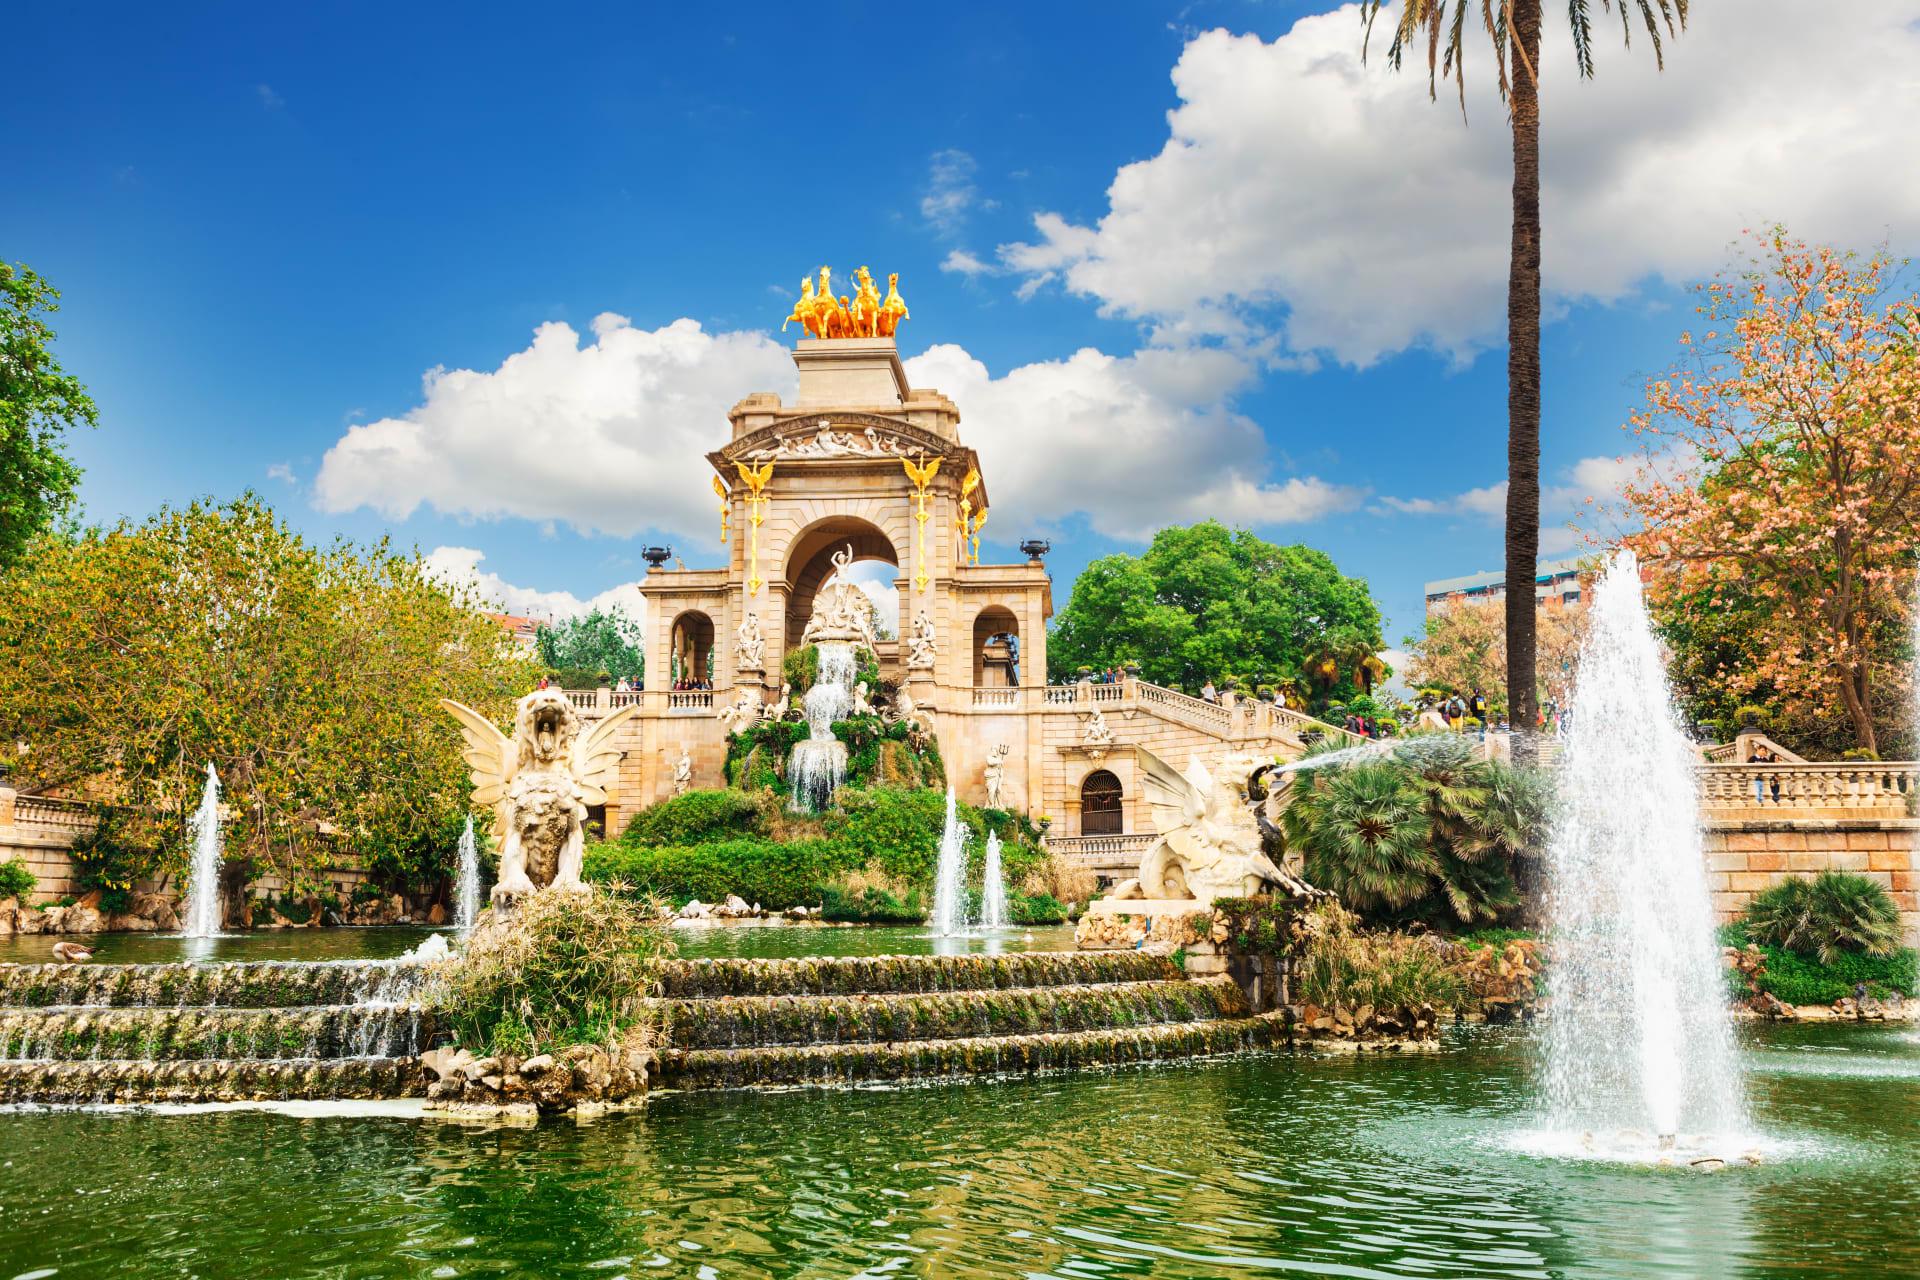 Barcelona - Barcelona: Lights and Shadows of Ciutadella Park